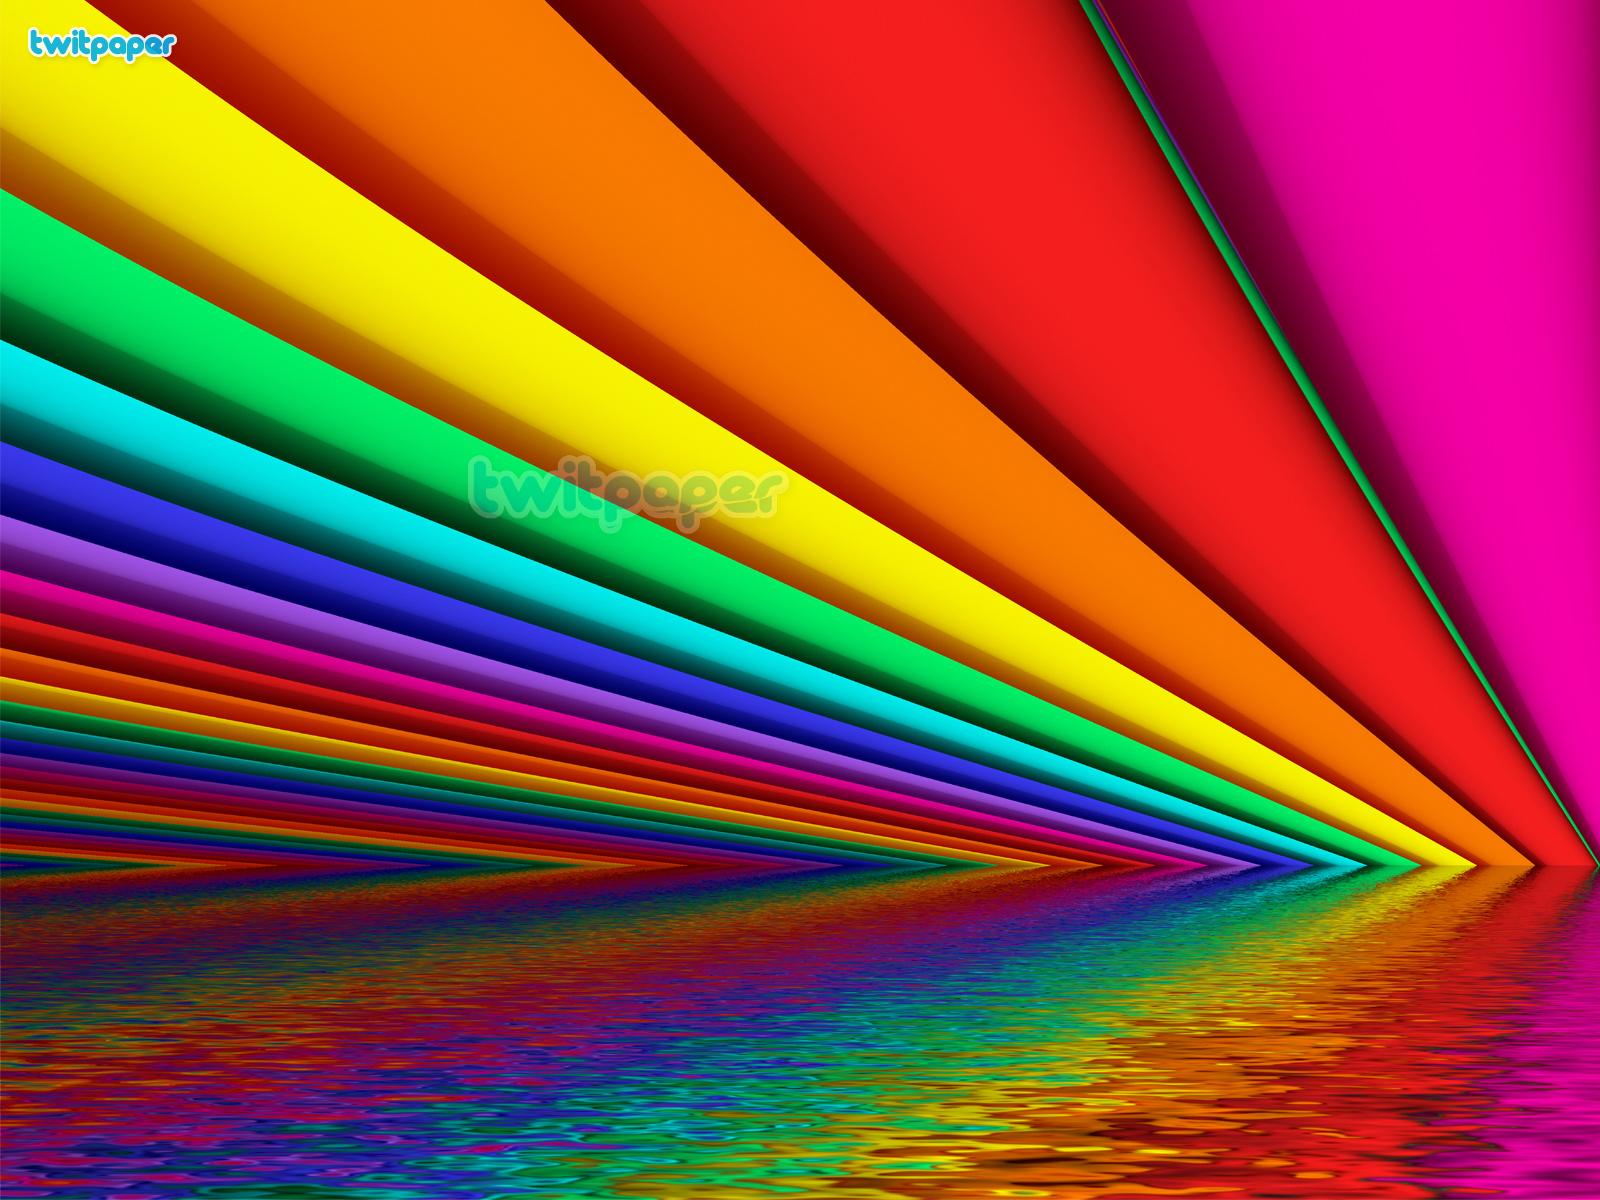 Color Theory 102 | suck it, martha